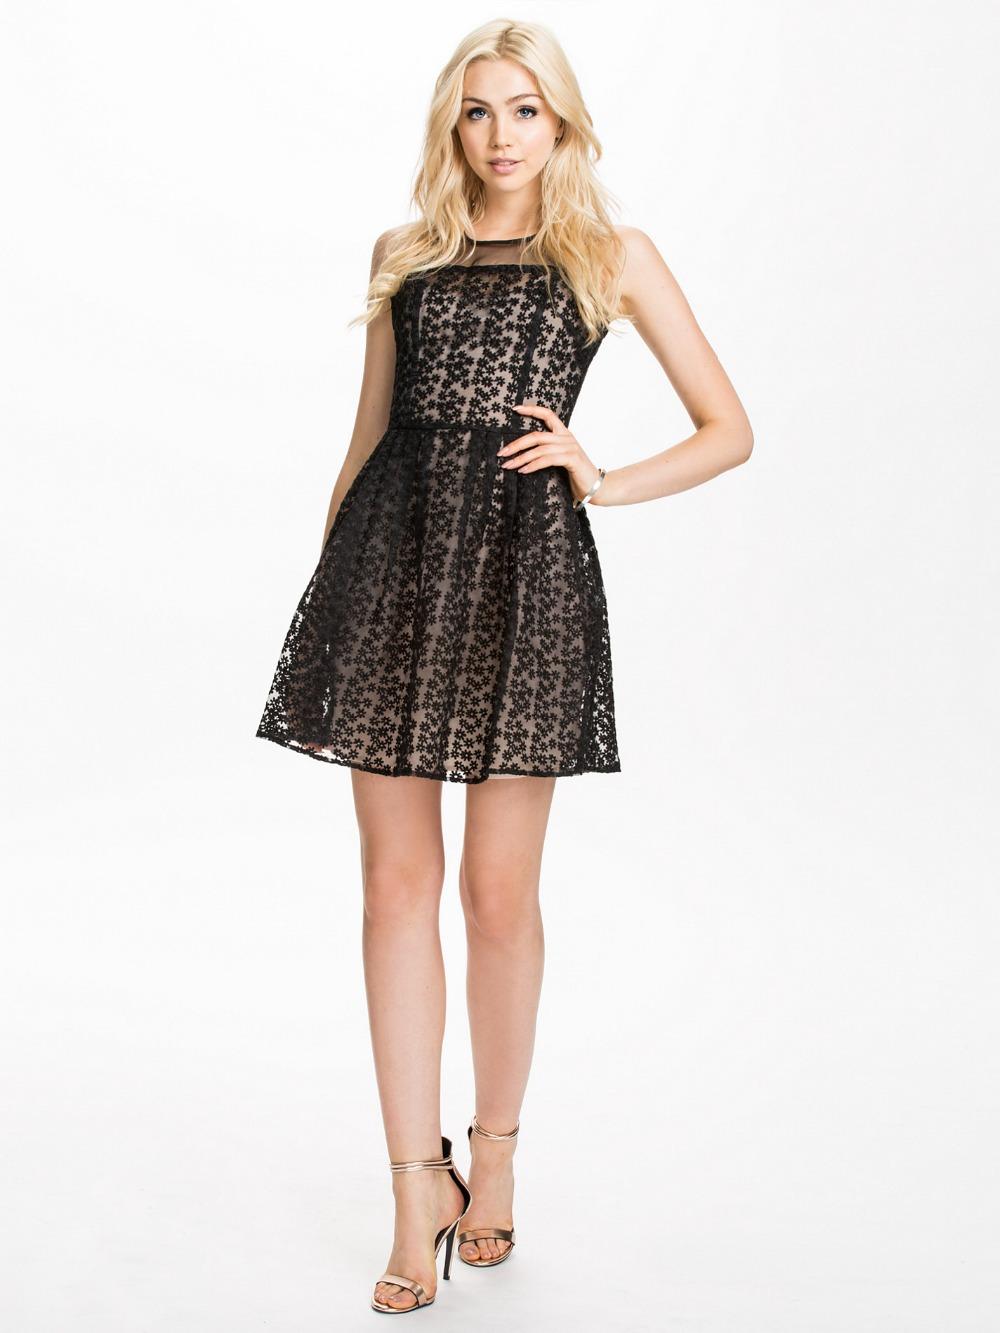 2 Cute Clothing